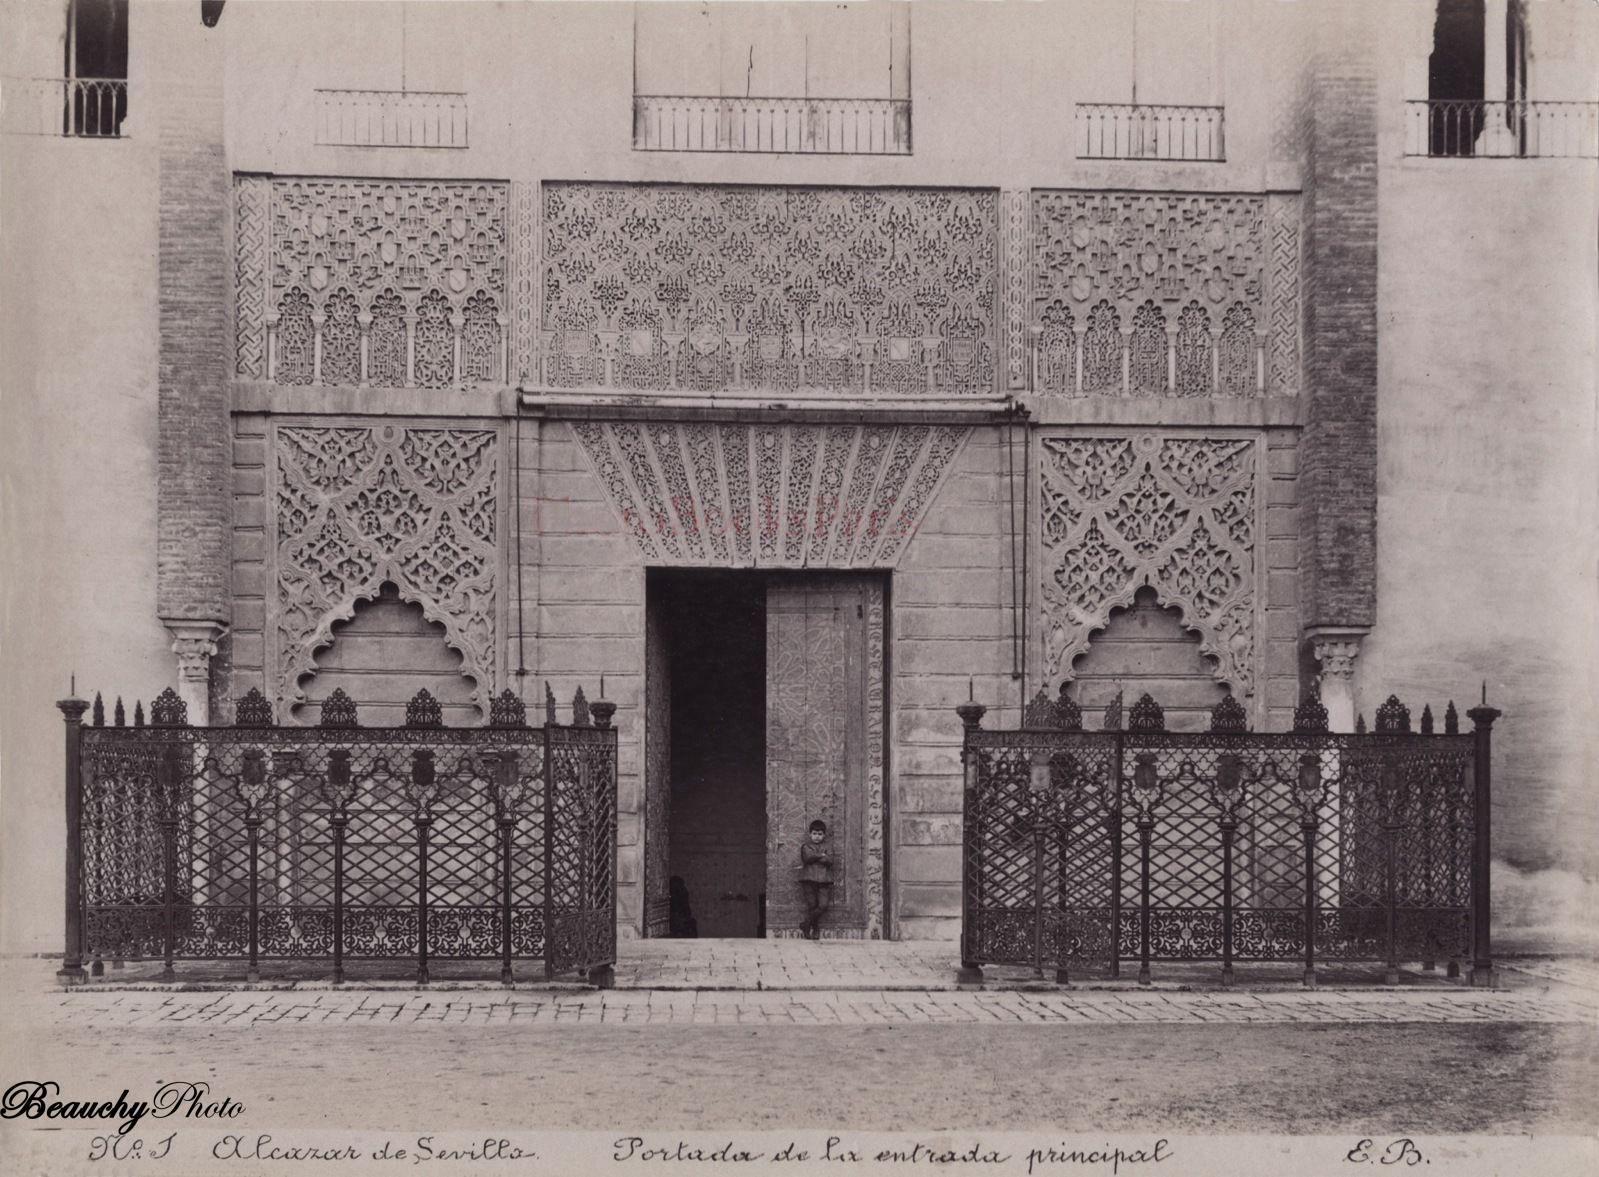 Beauchyphoto_Portada_Alcázar_de_Sevilla_Emilio_Beauchy_Cano_fotografias_antiguas_postales_vistas_y_monumentos